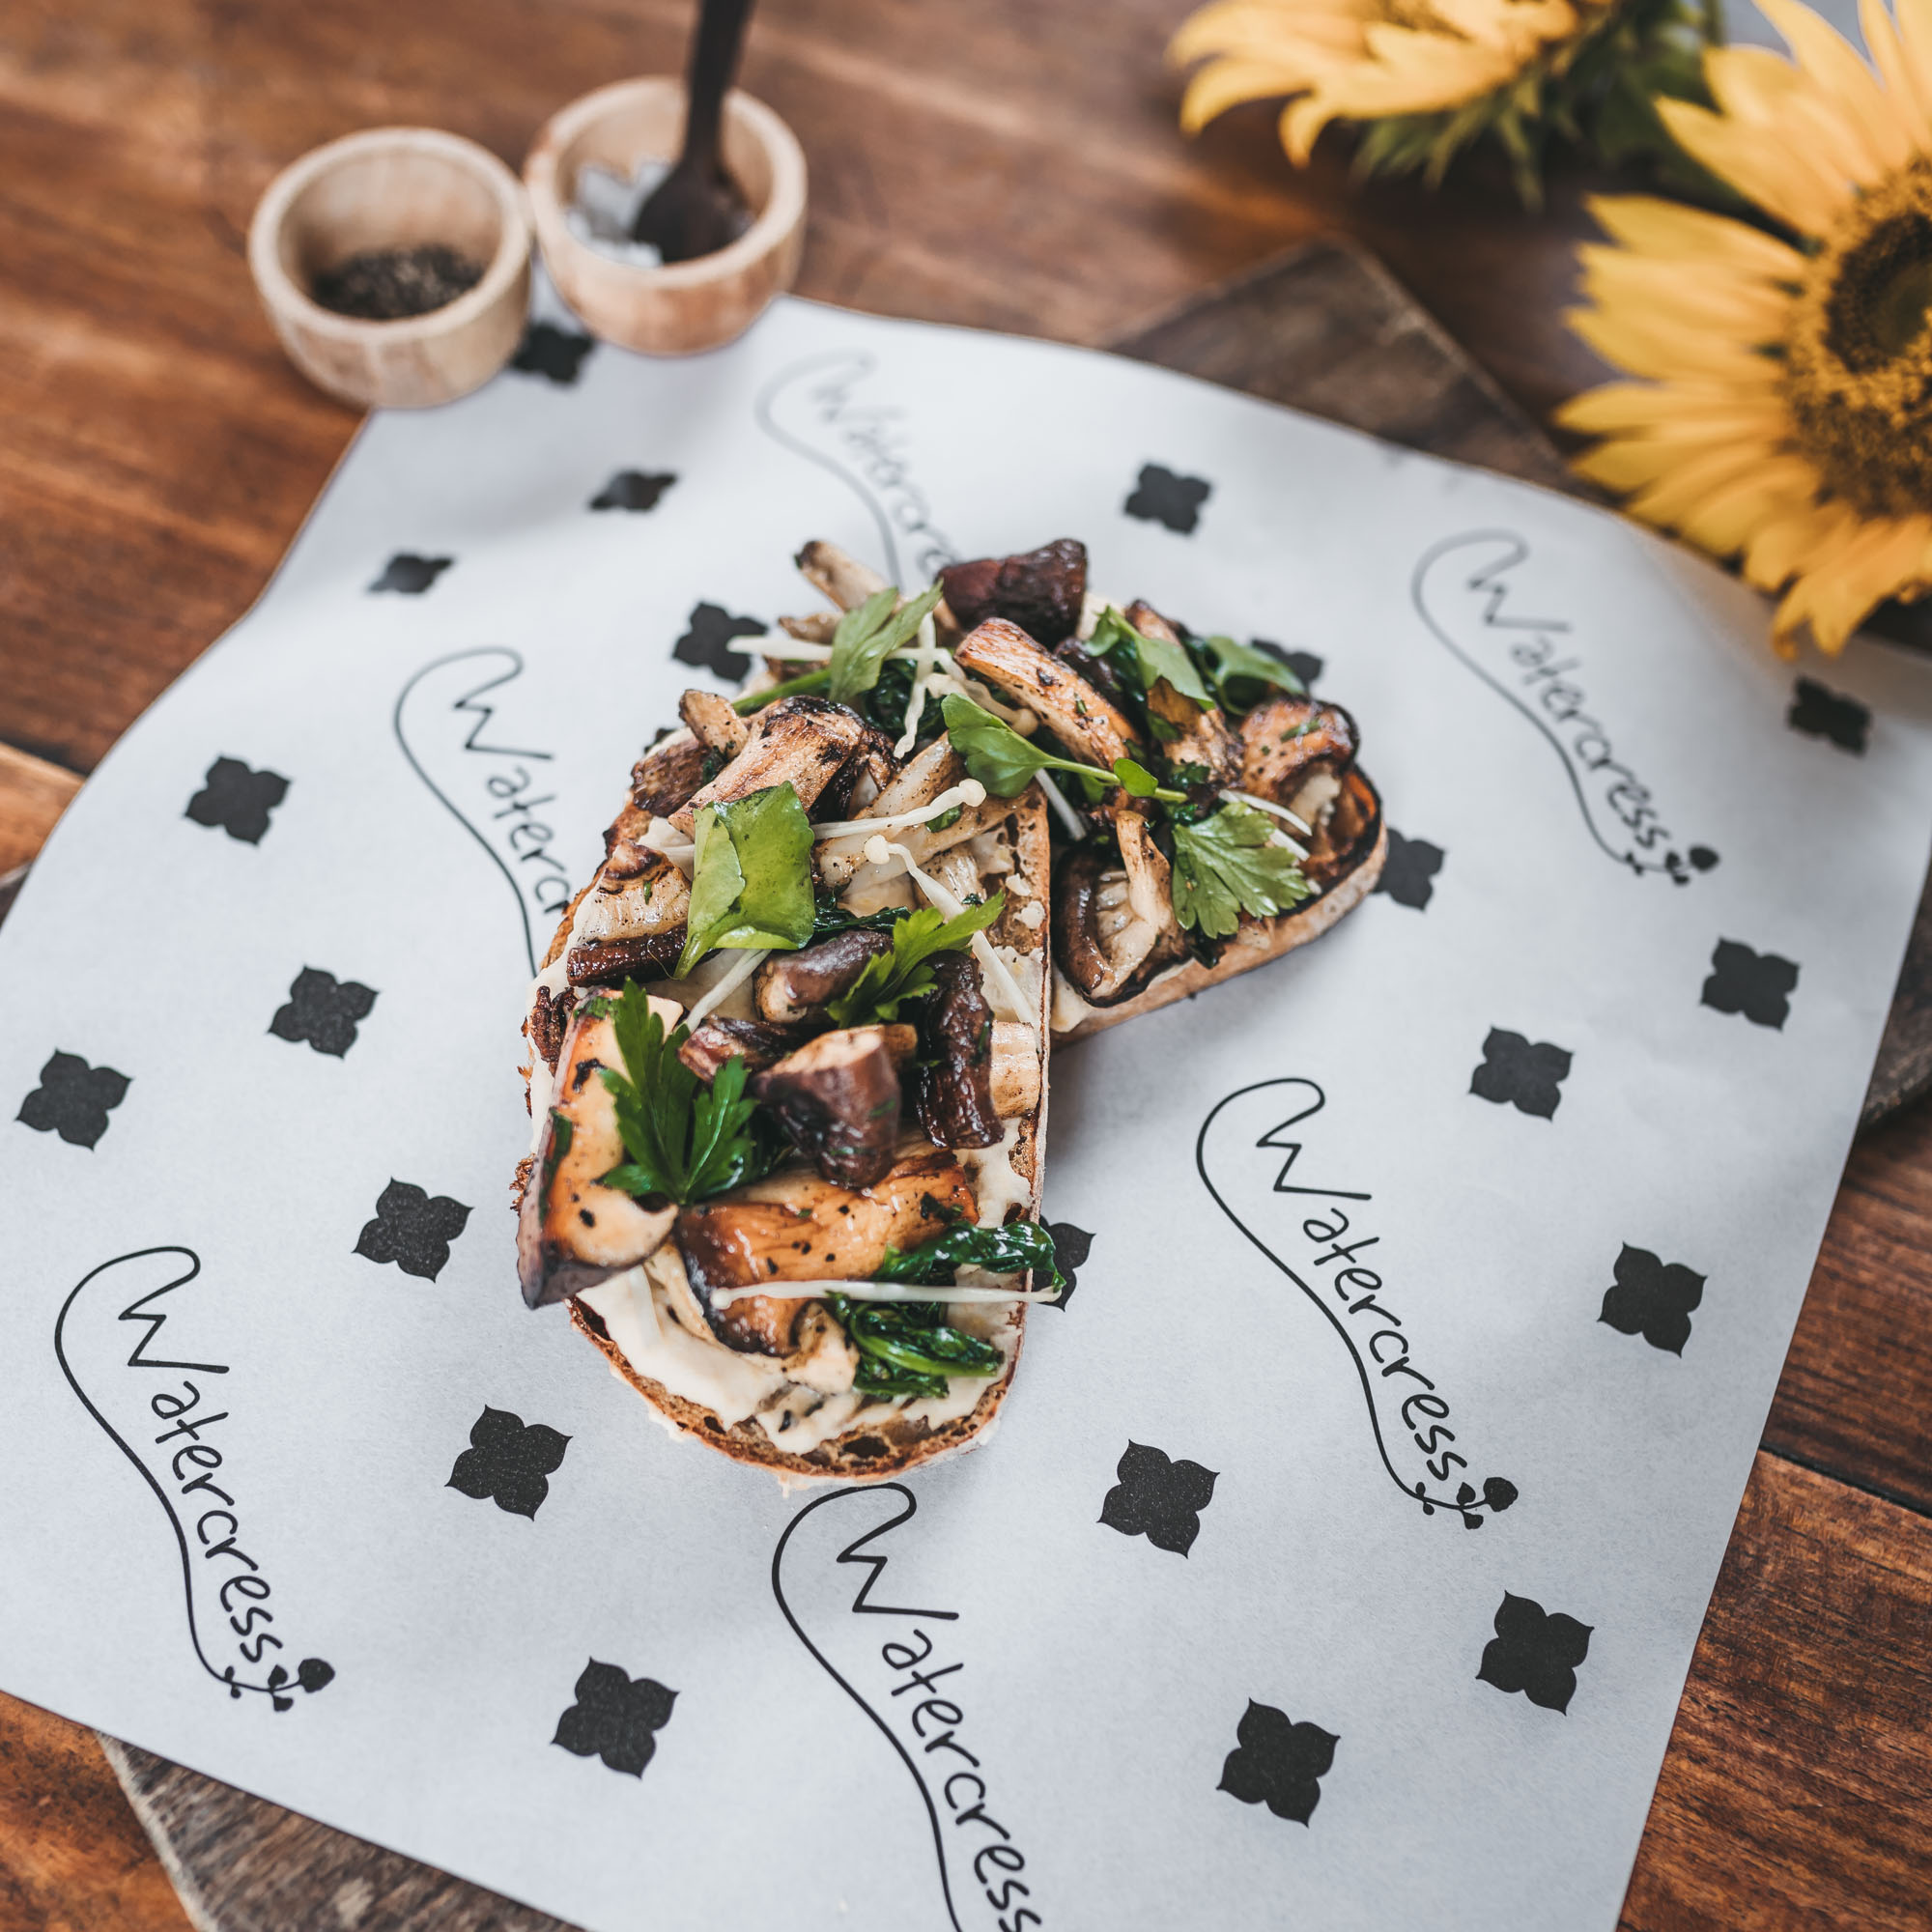 keira-mason-watercress-mushrooms-on-toast-cafe.jpg